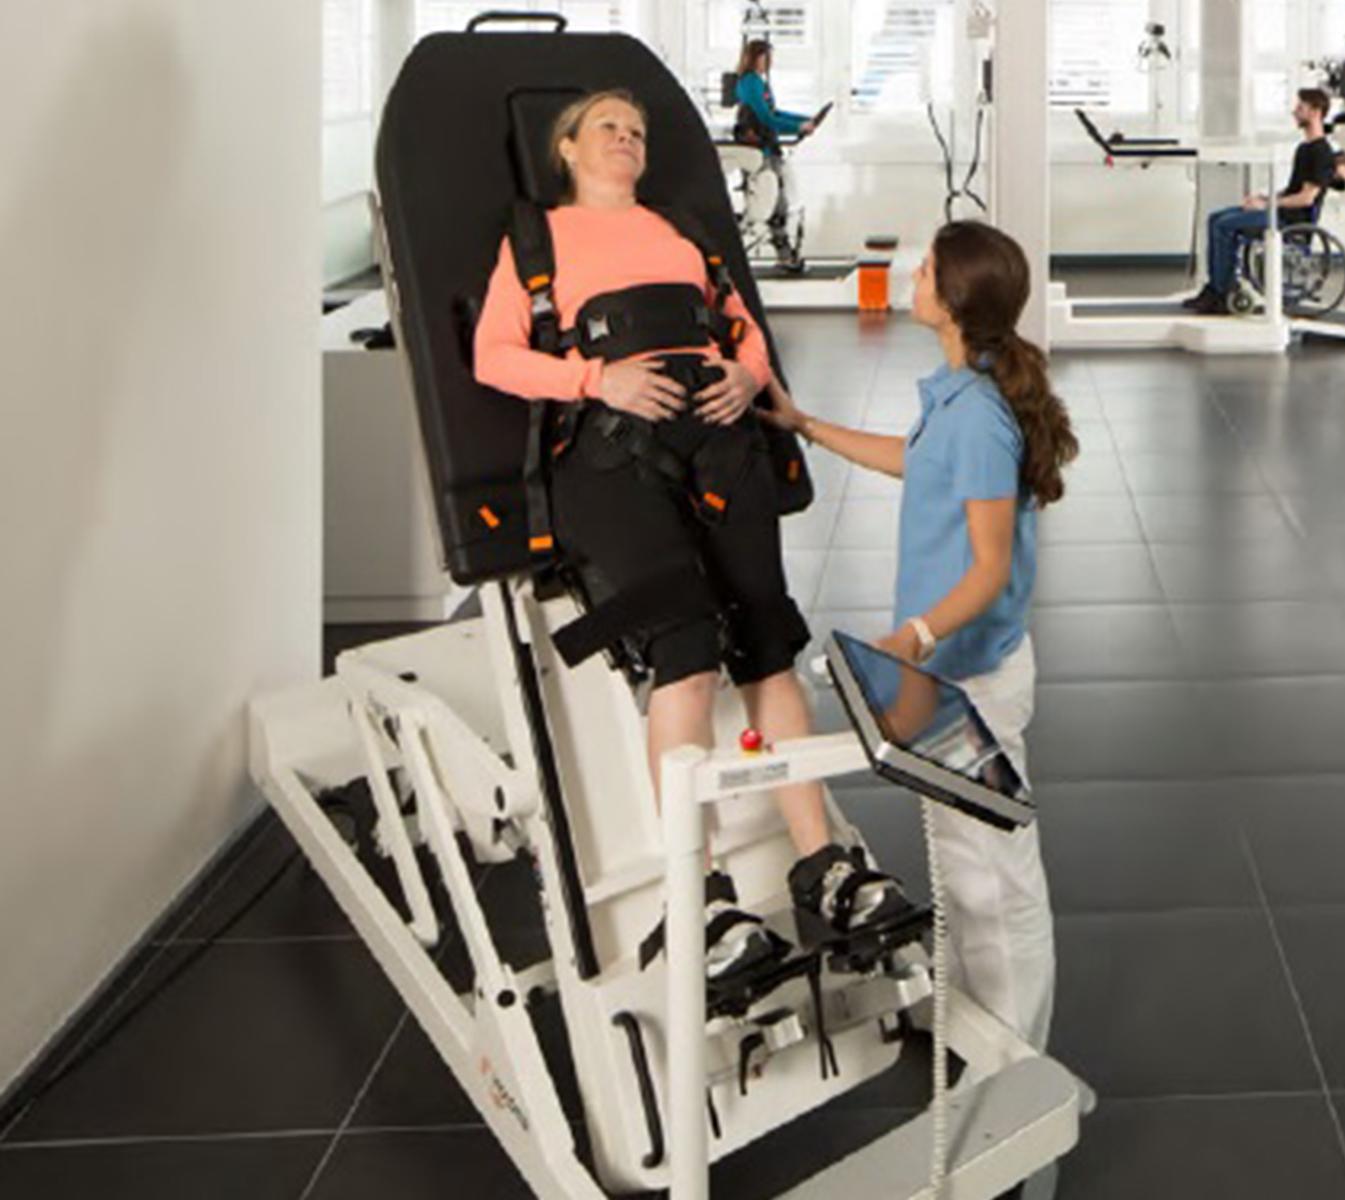 Erigo (Hocoma) Neuroriabilitazione e Robotica